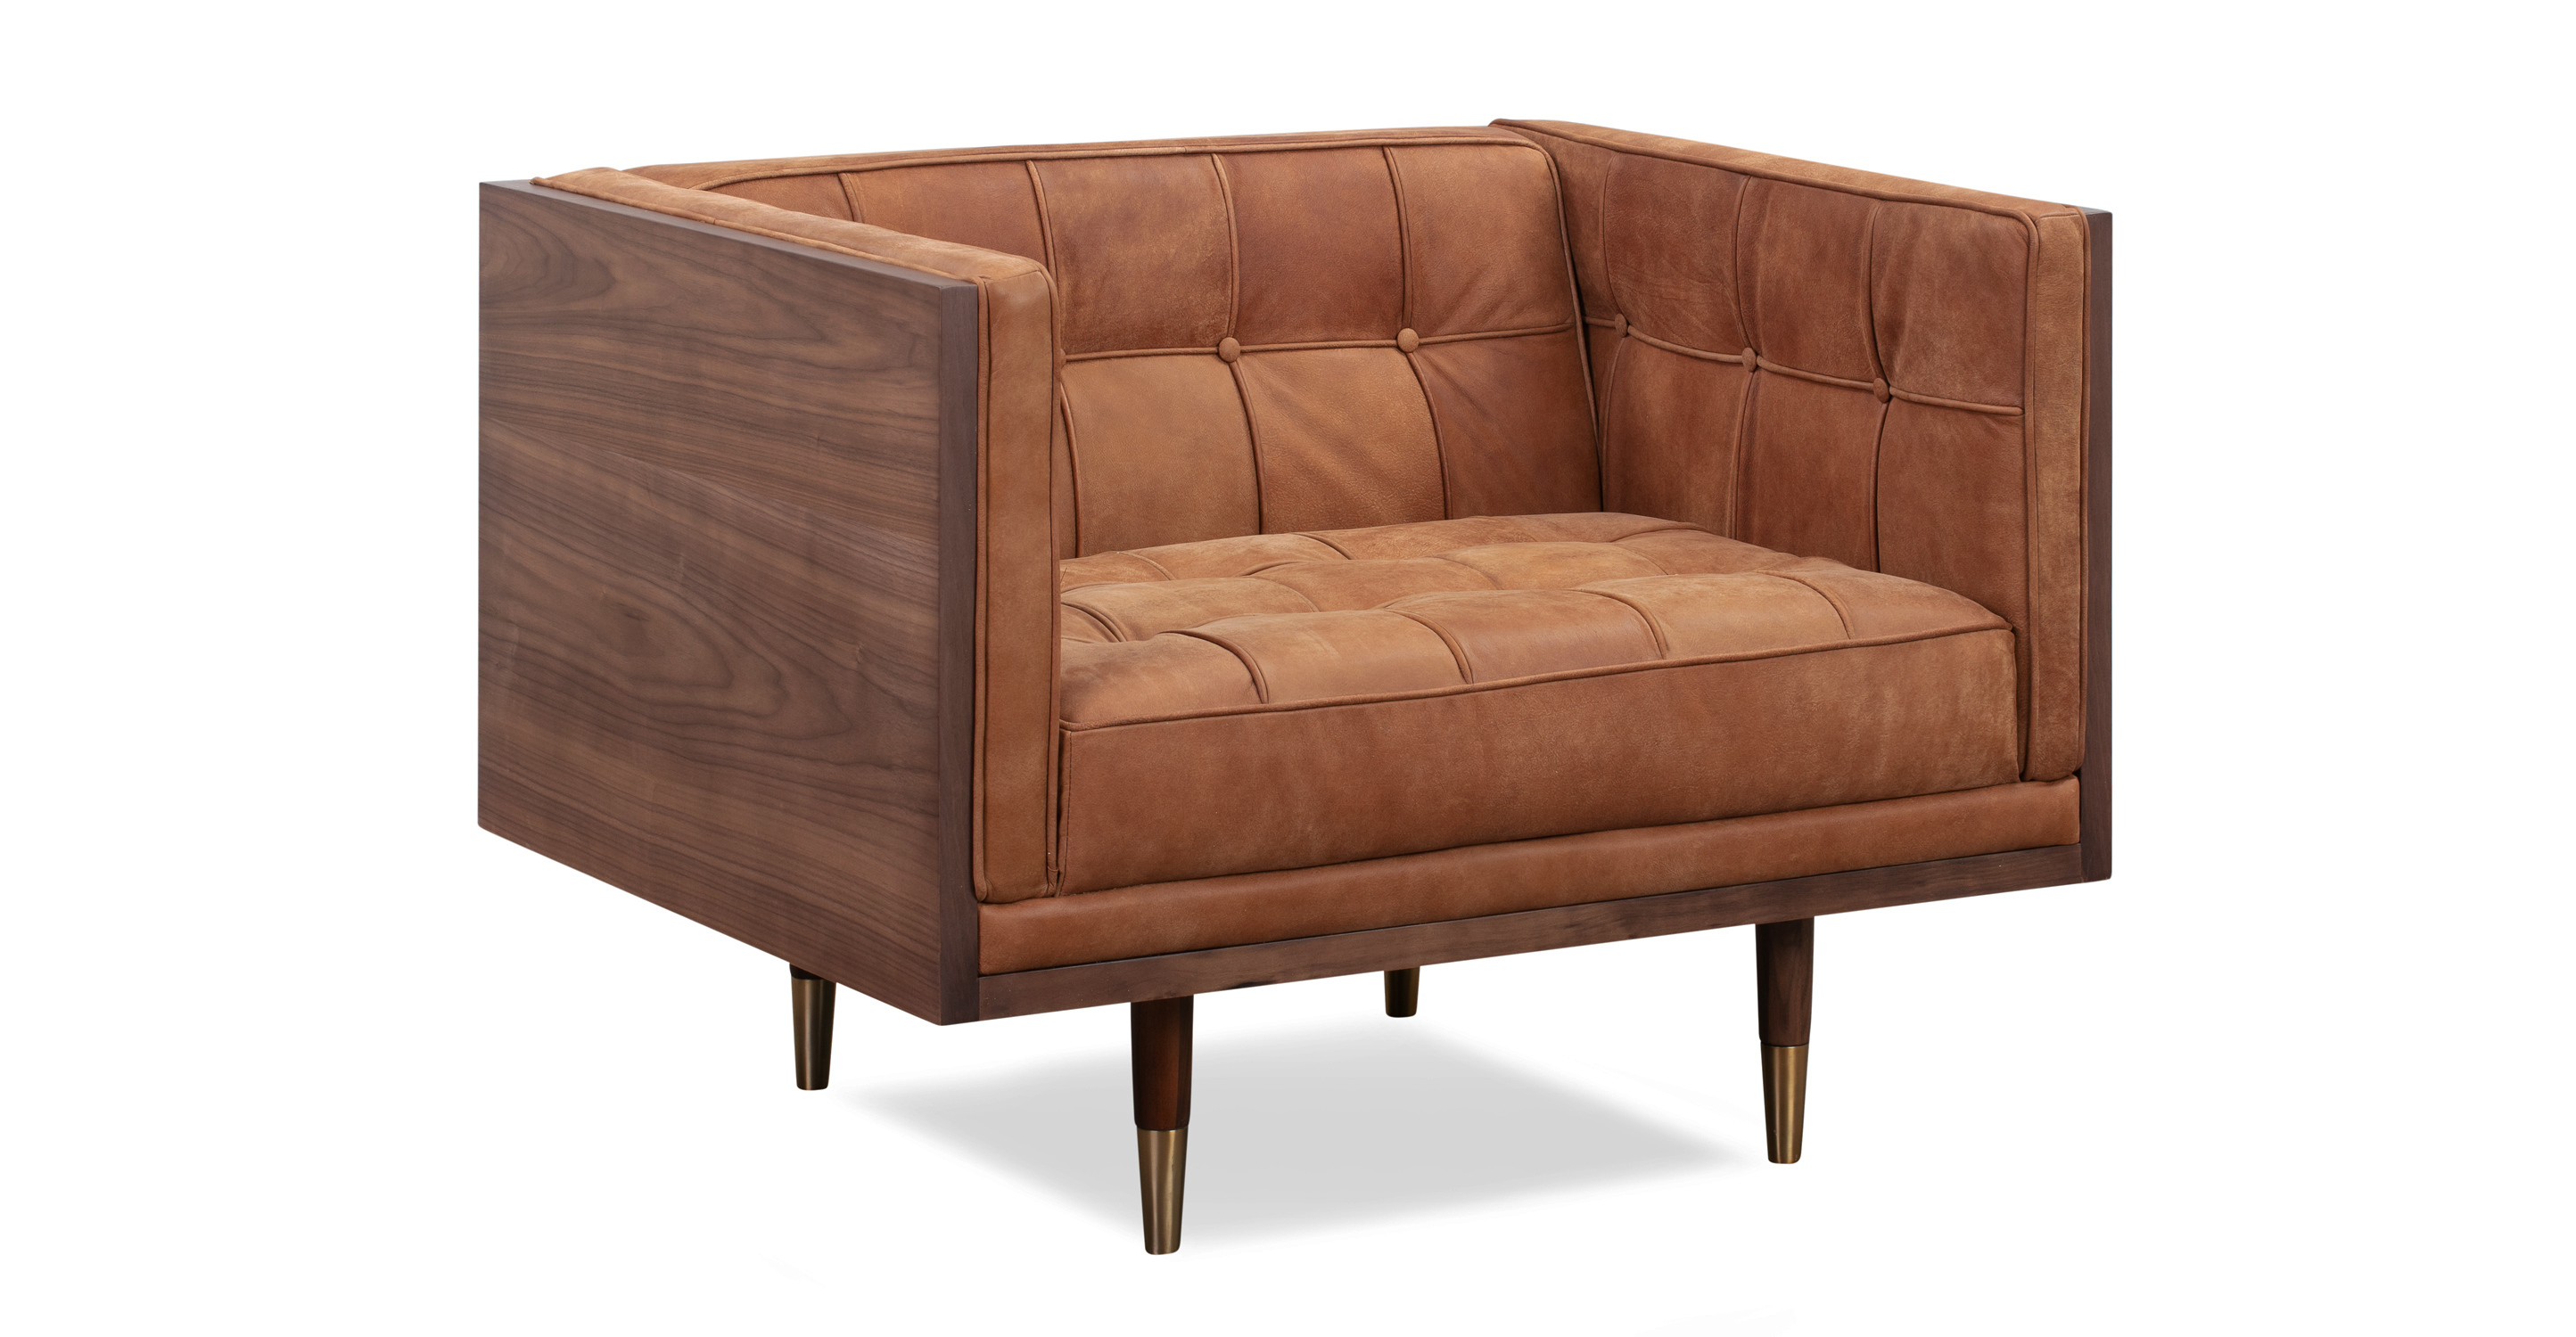 Woodrow Box Leather Chair, Walnut/Cognac